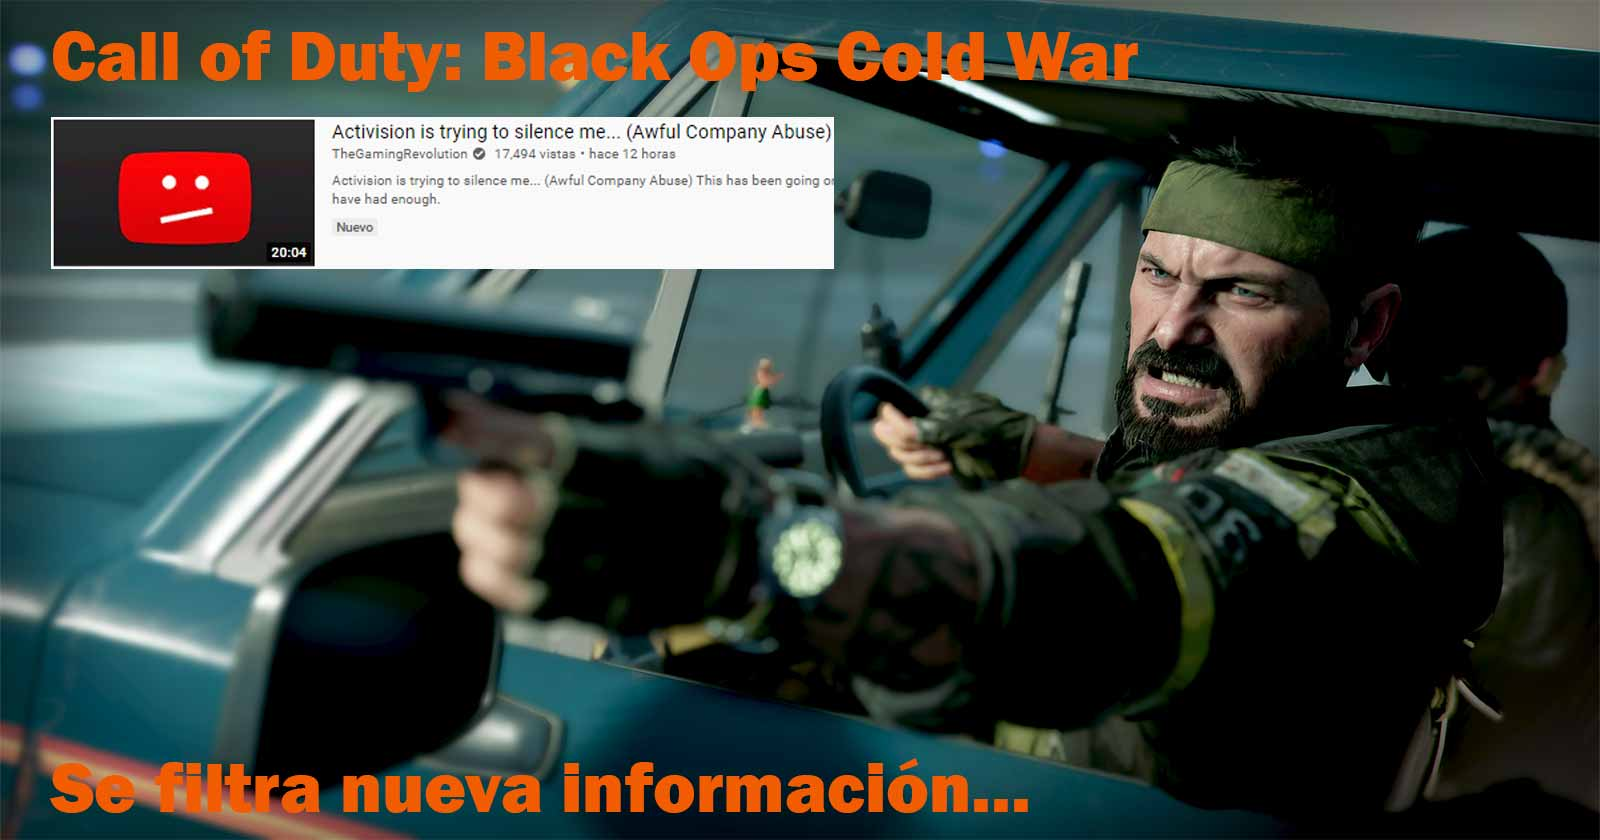 CALL OF DUTY: BLACK OPS COLD WAR ZOMBIES FILTRA INFORMACIÓN, ACTIVISION LO ELIMINA...